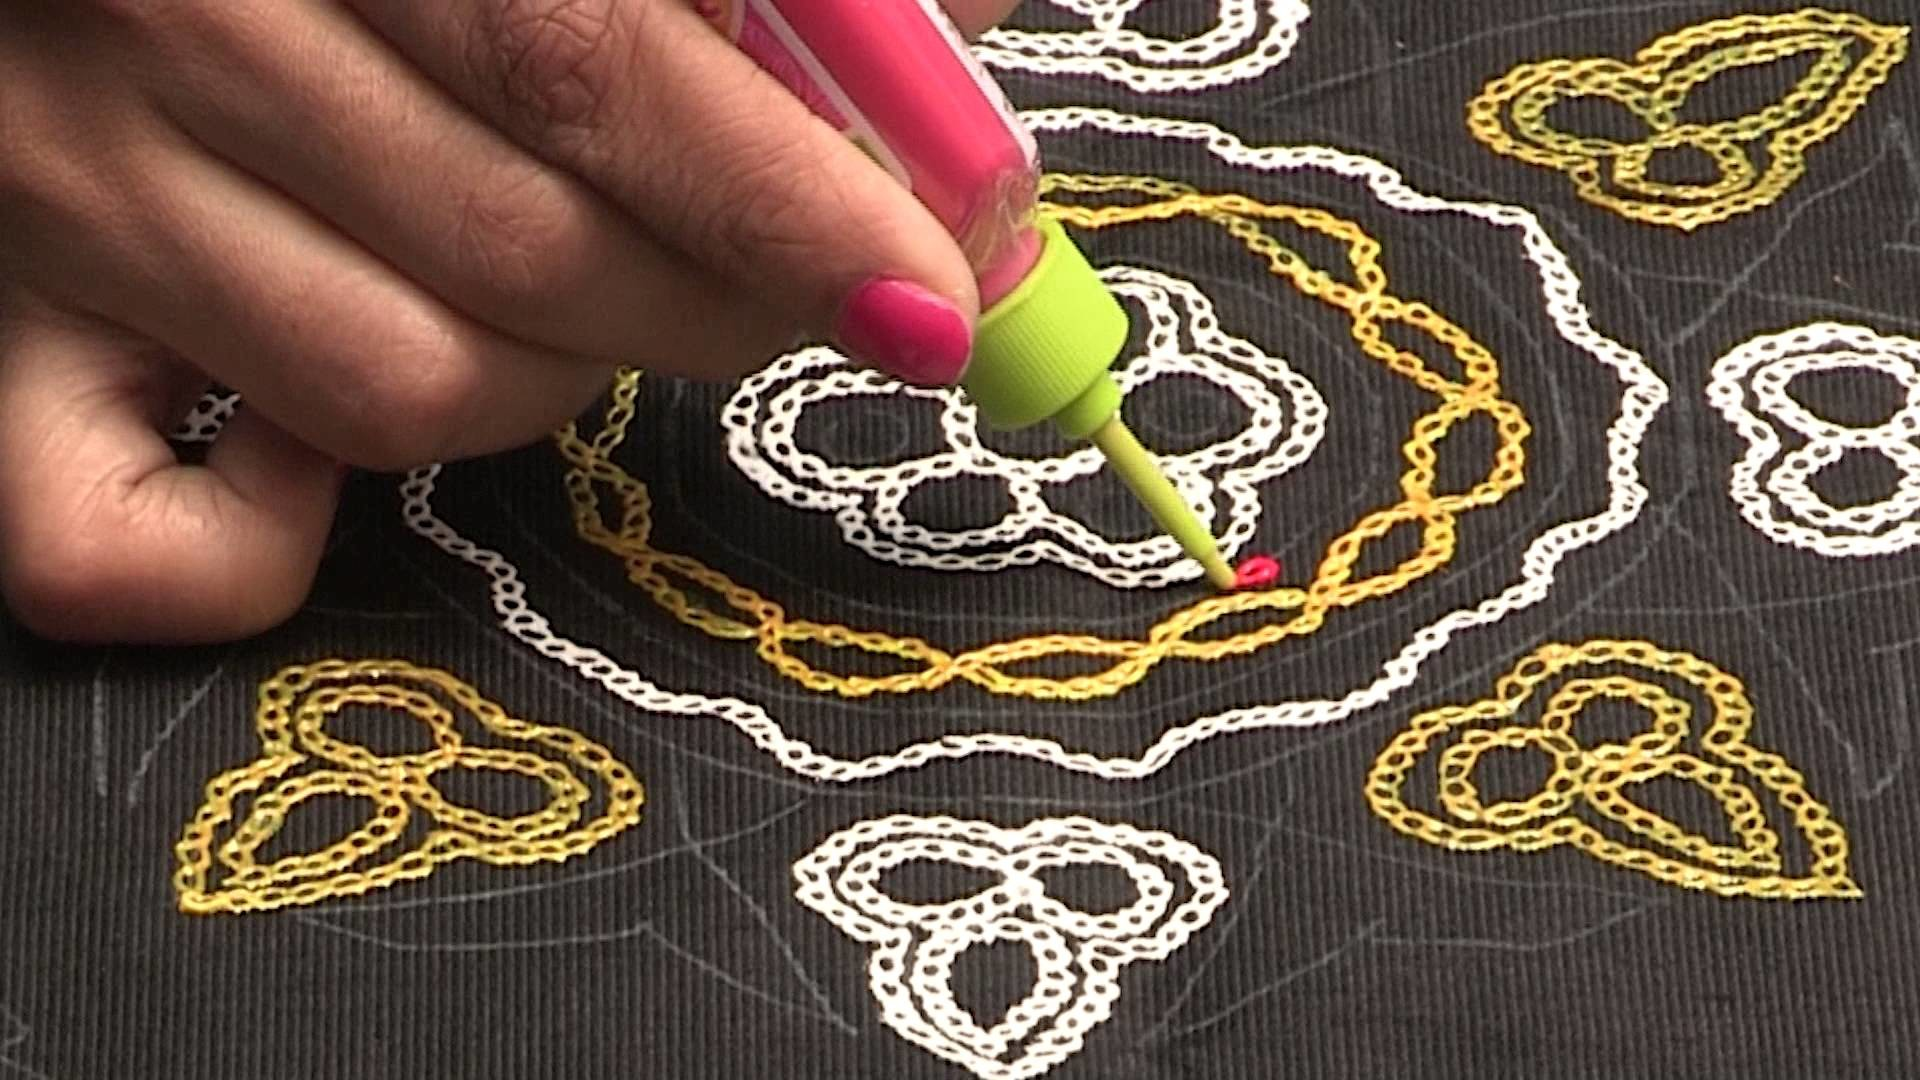 Liquid embroidery aari work butta design my crafts and